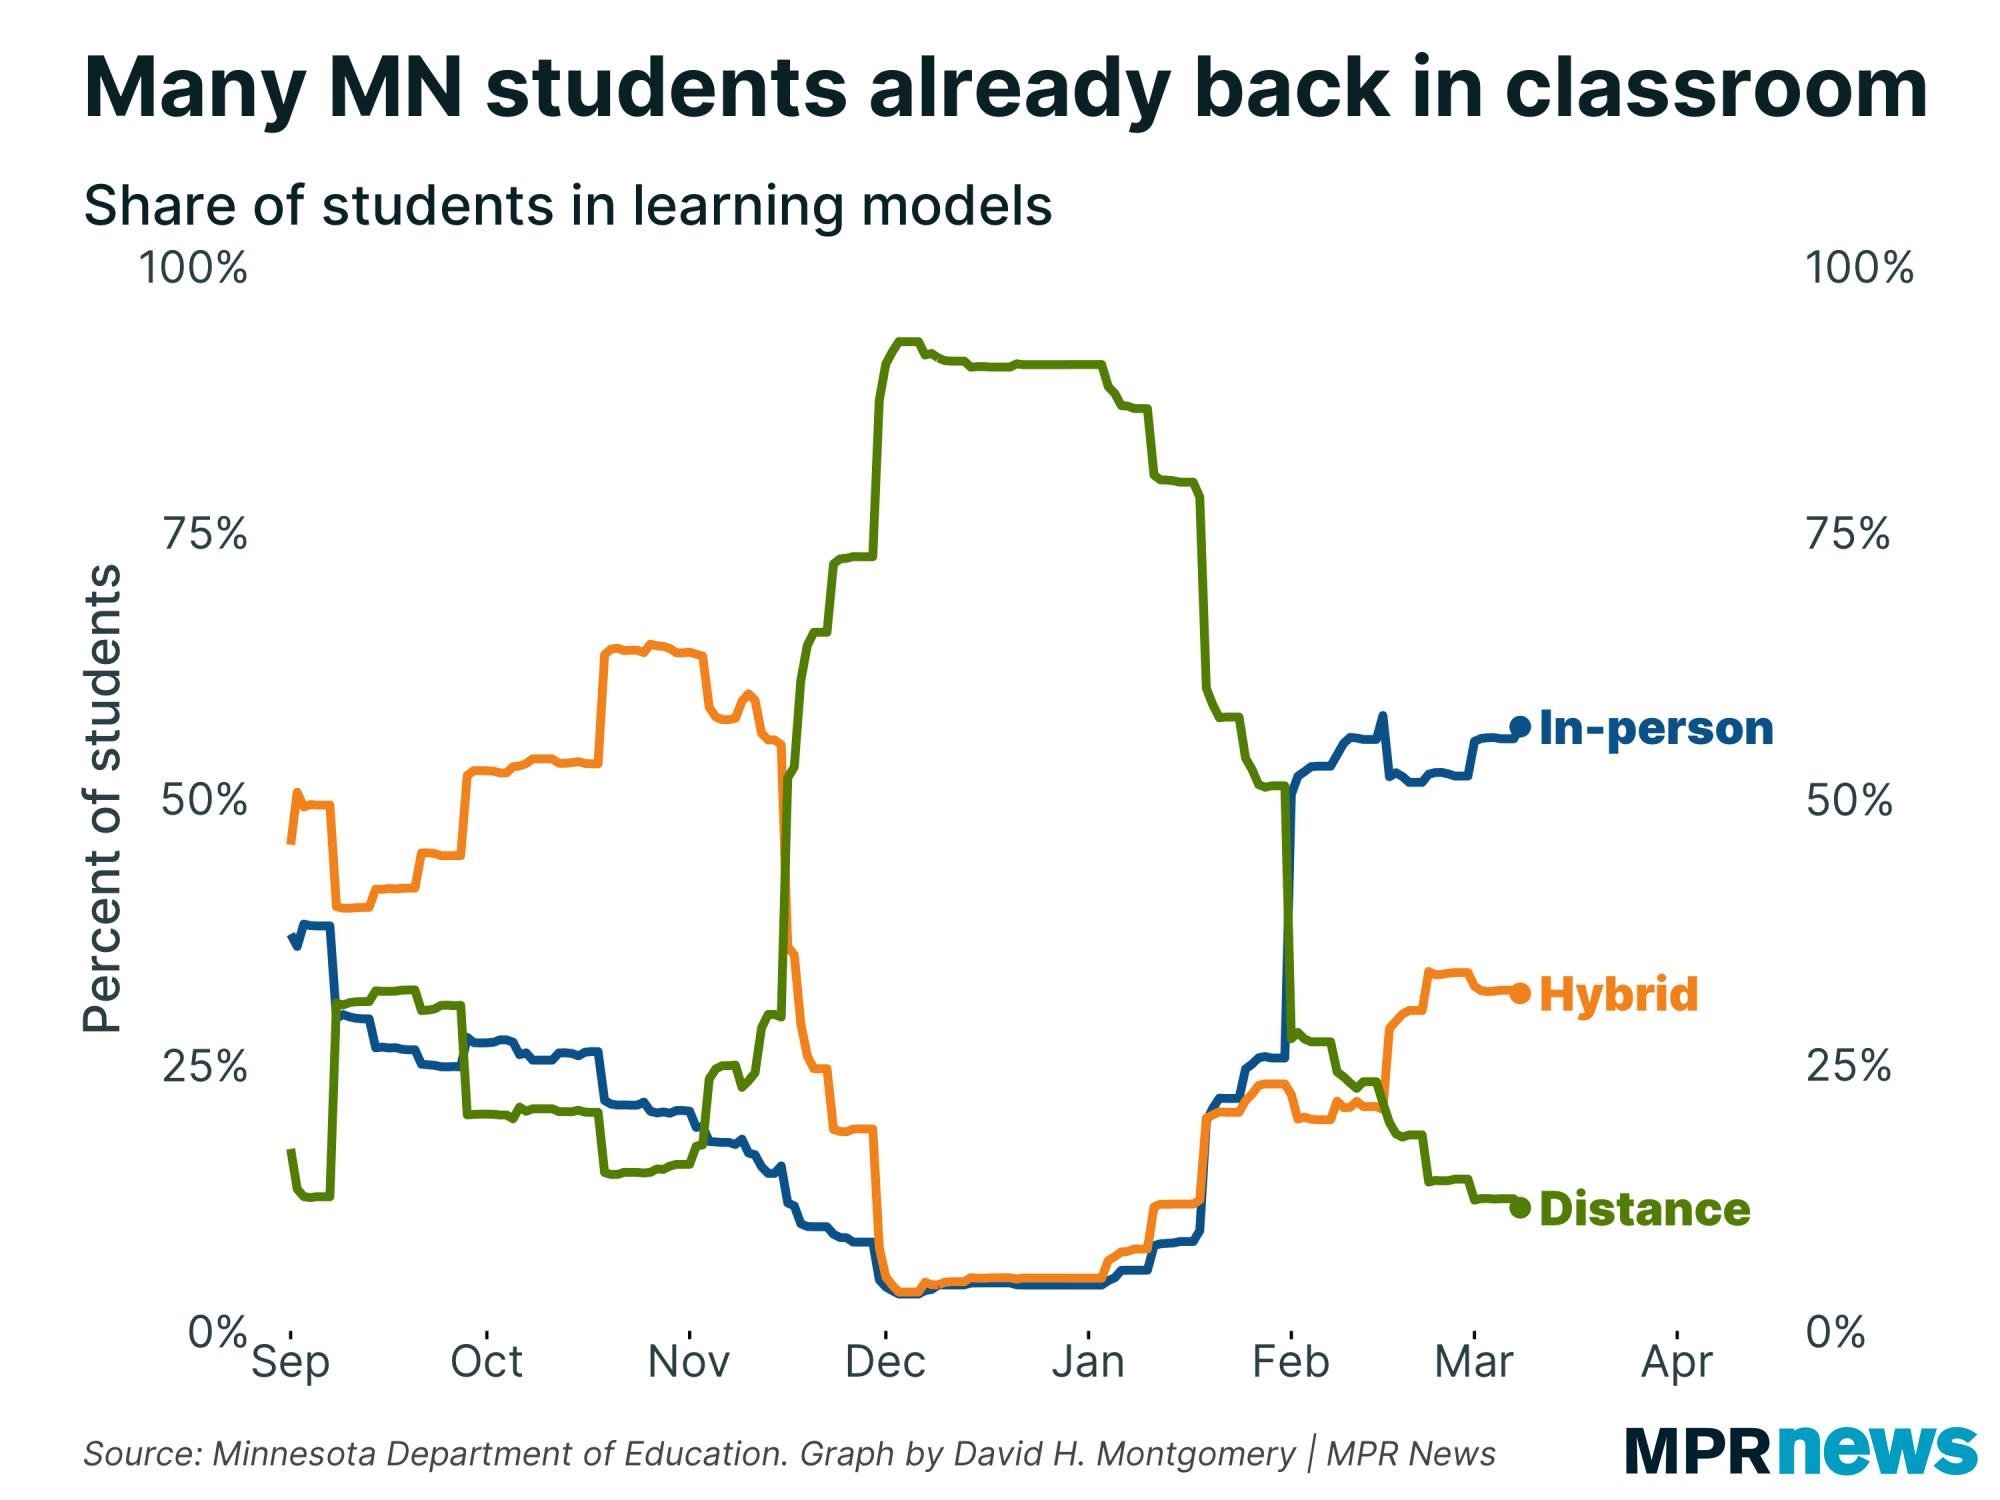 Many Minnesota students already back in classrooms